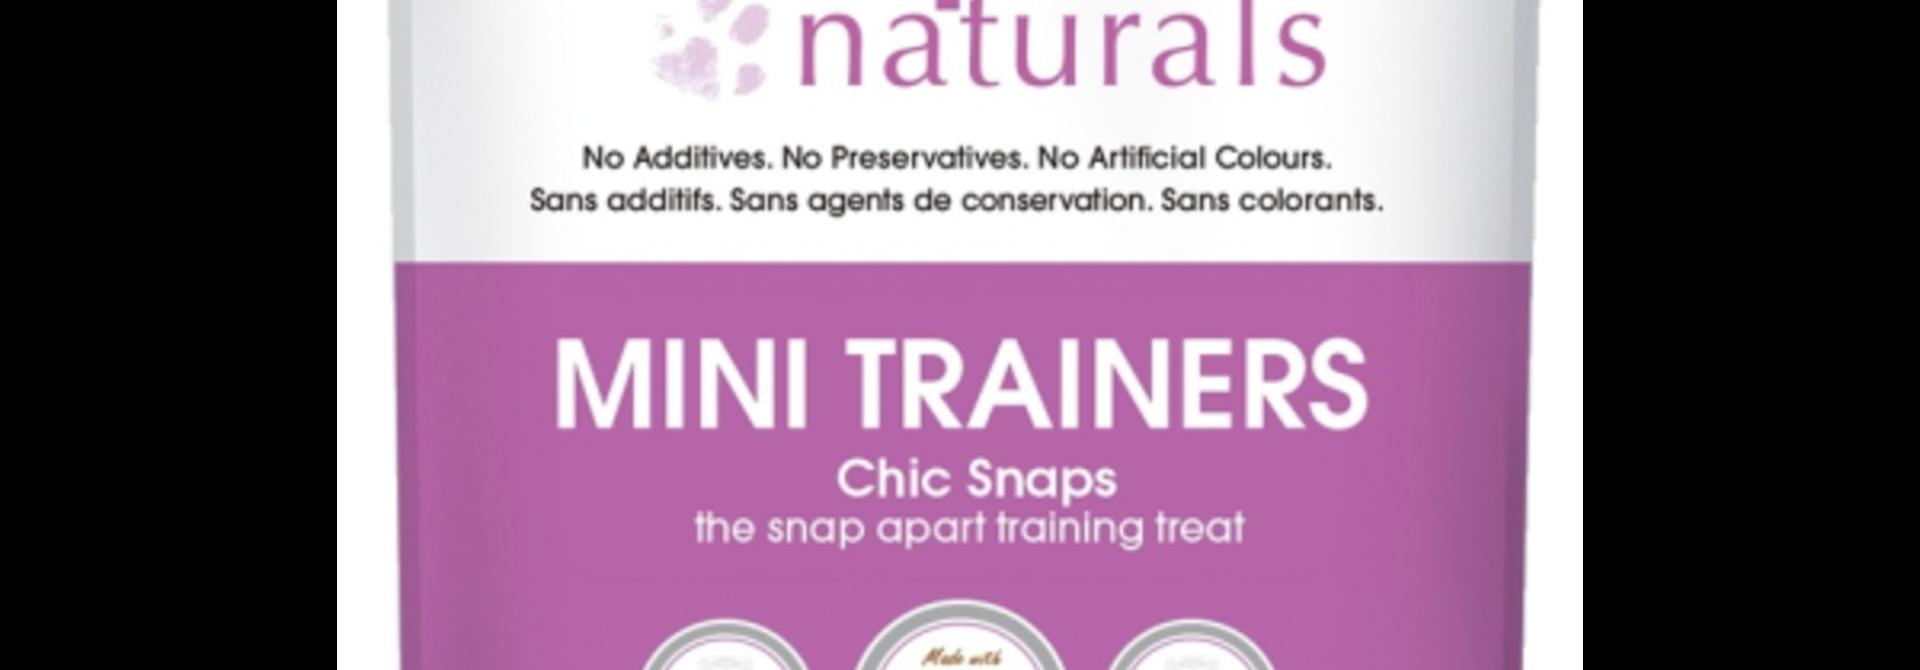 Crumps' Dog Mini Trainiers Chic Snaps 4.2oz